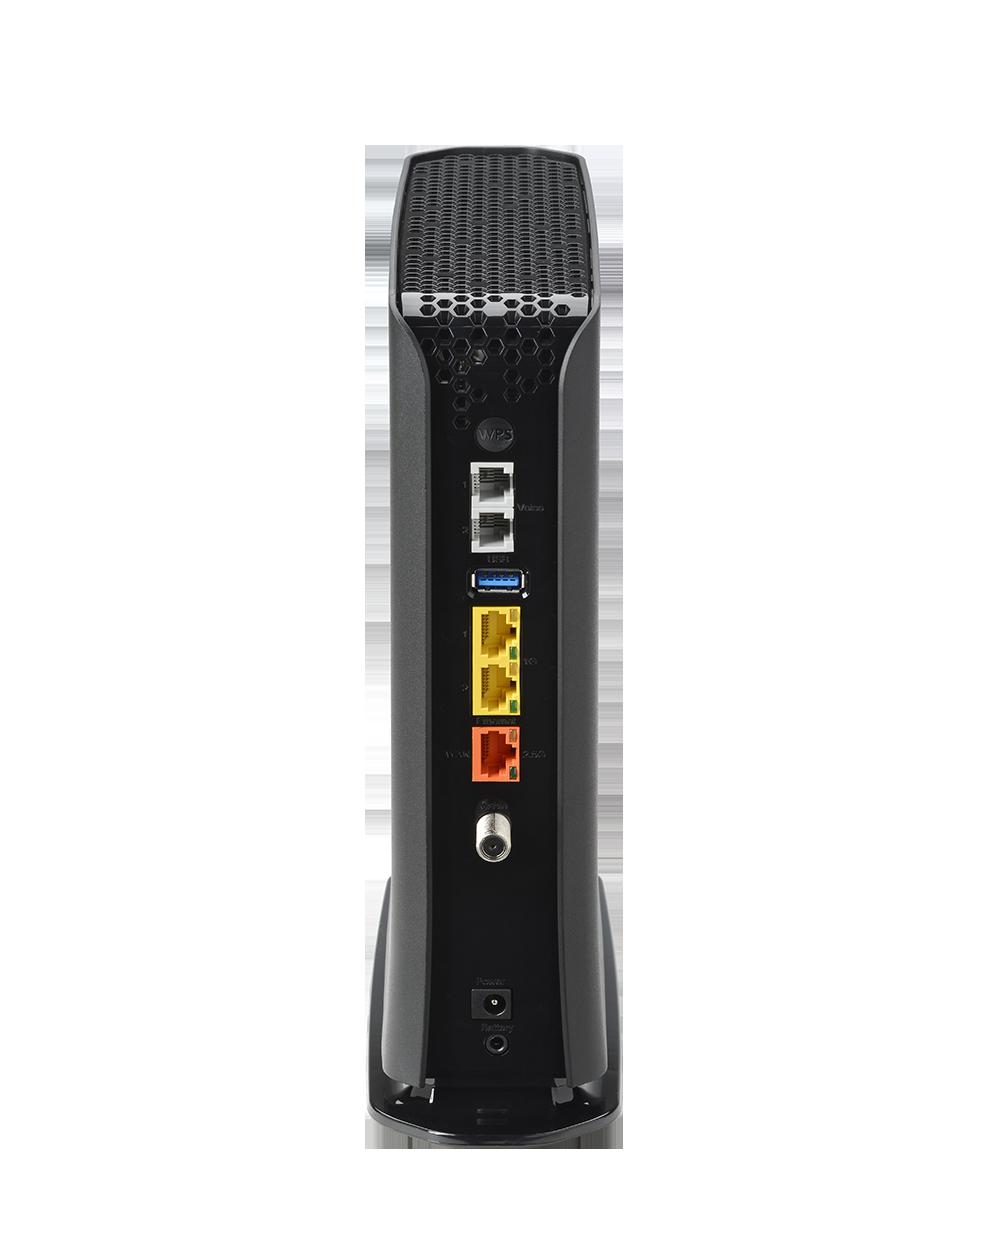 DOCSIS 3.1 Cable Modem Router with Voice - Hitron CODA5814